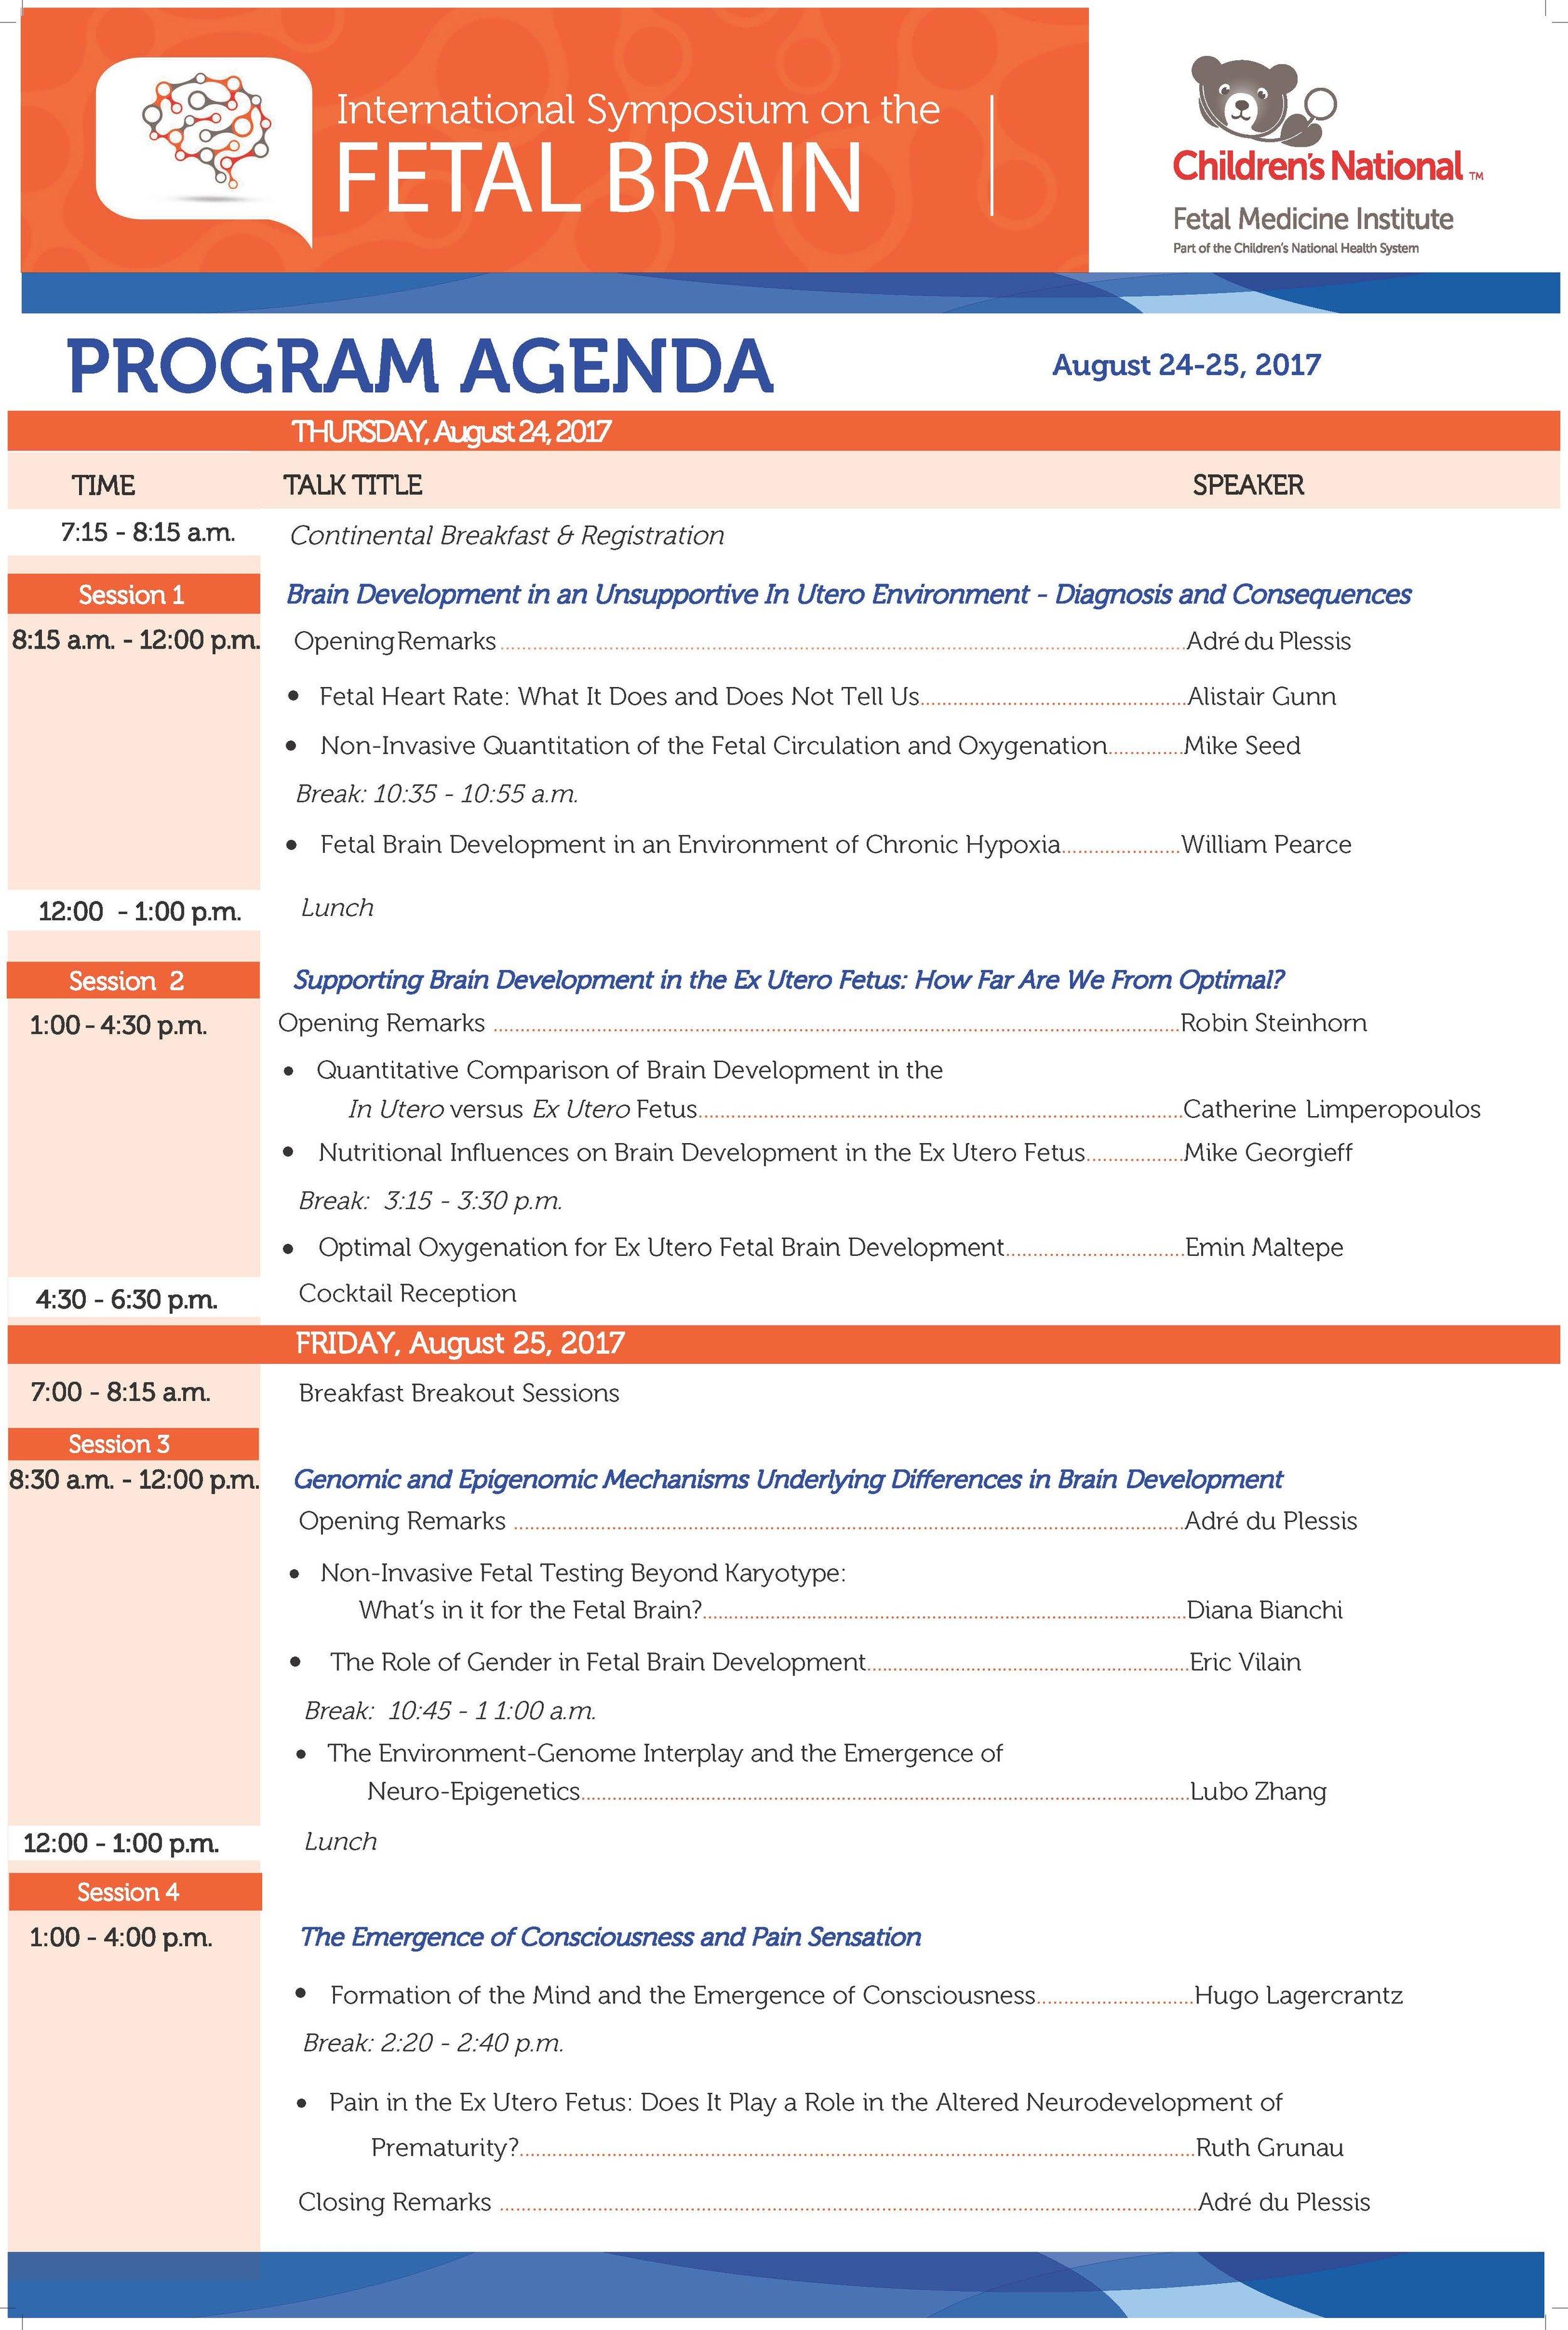 ISFB 2017 Final Agenda_Page_1.jpg